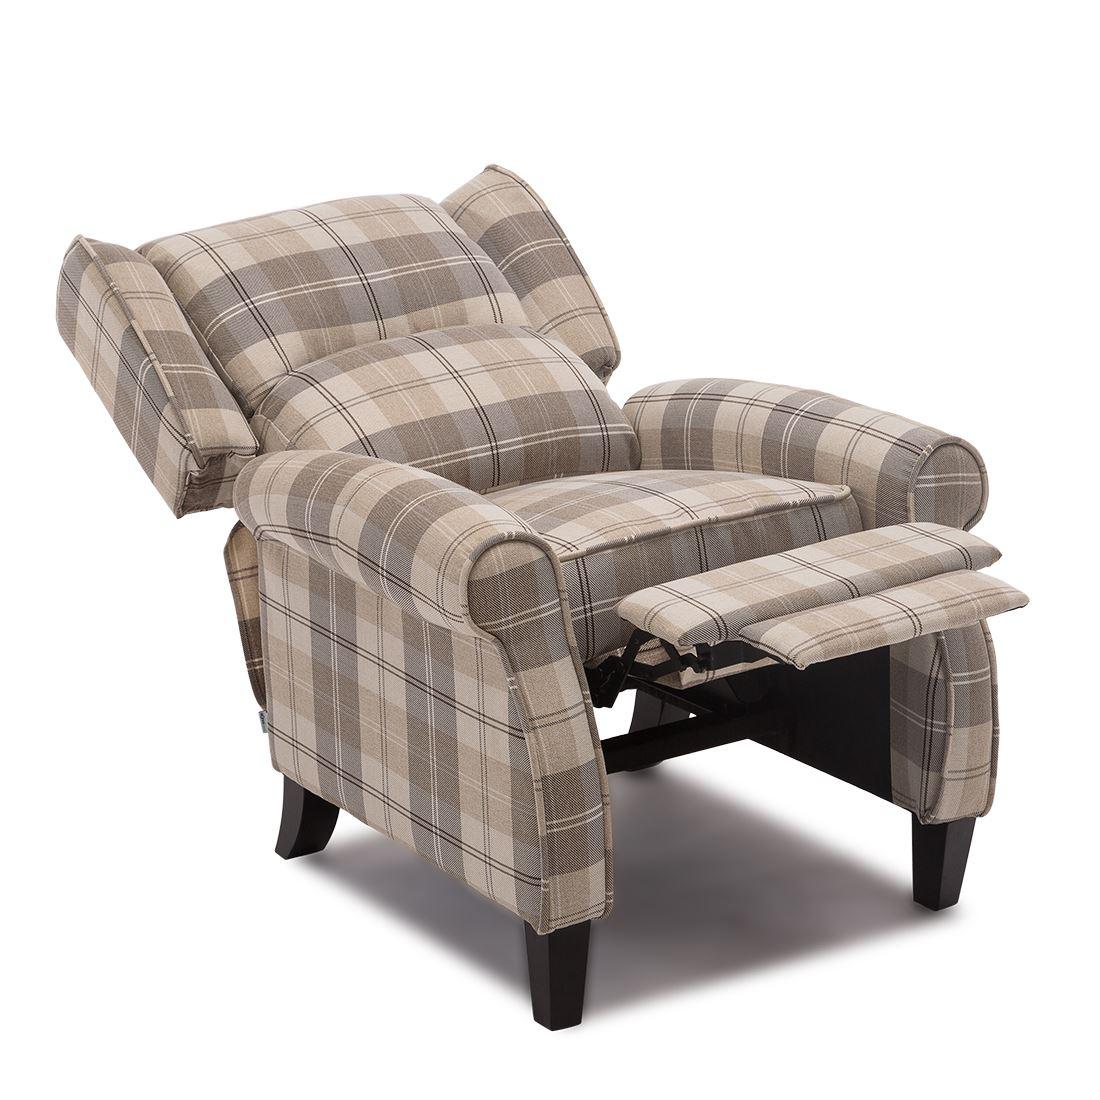 wing back chair recliner zebra print desk eaton fireside check fabric armchair